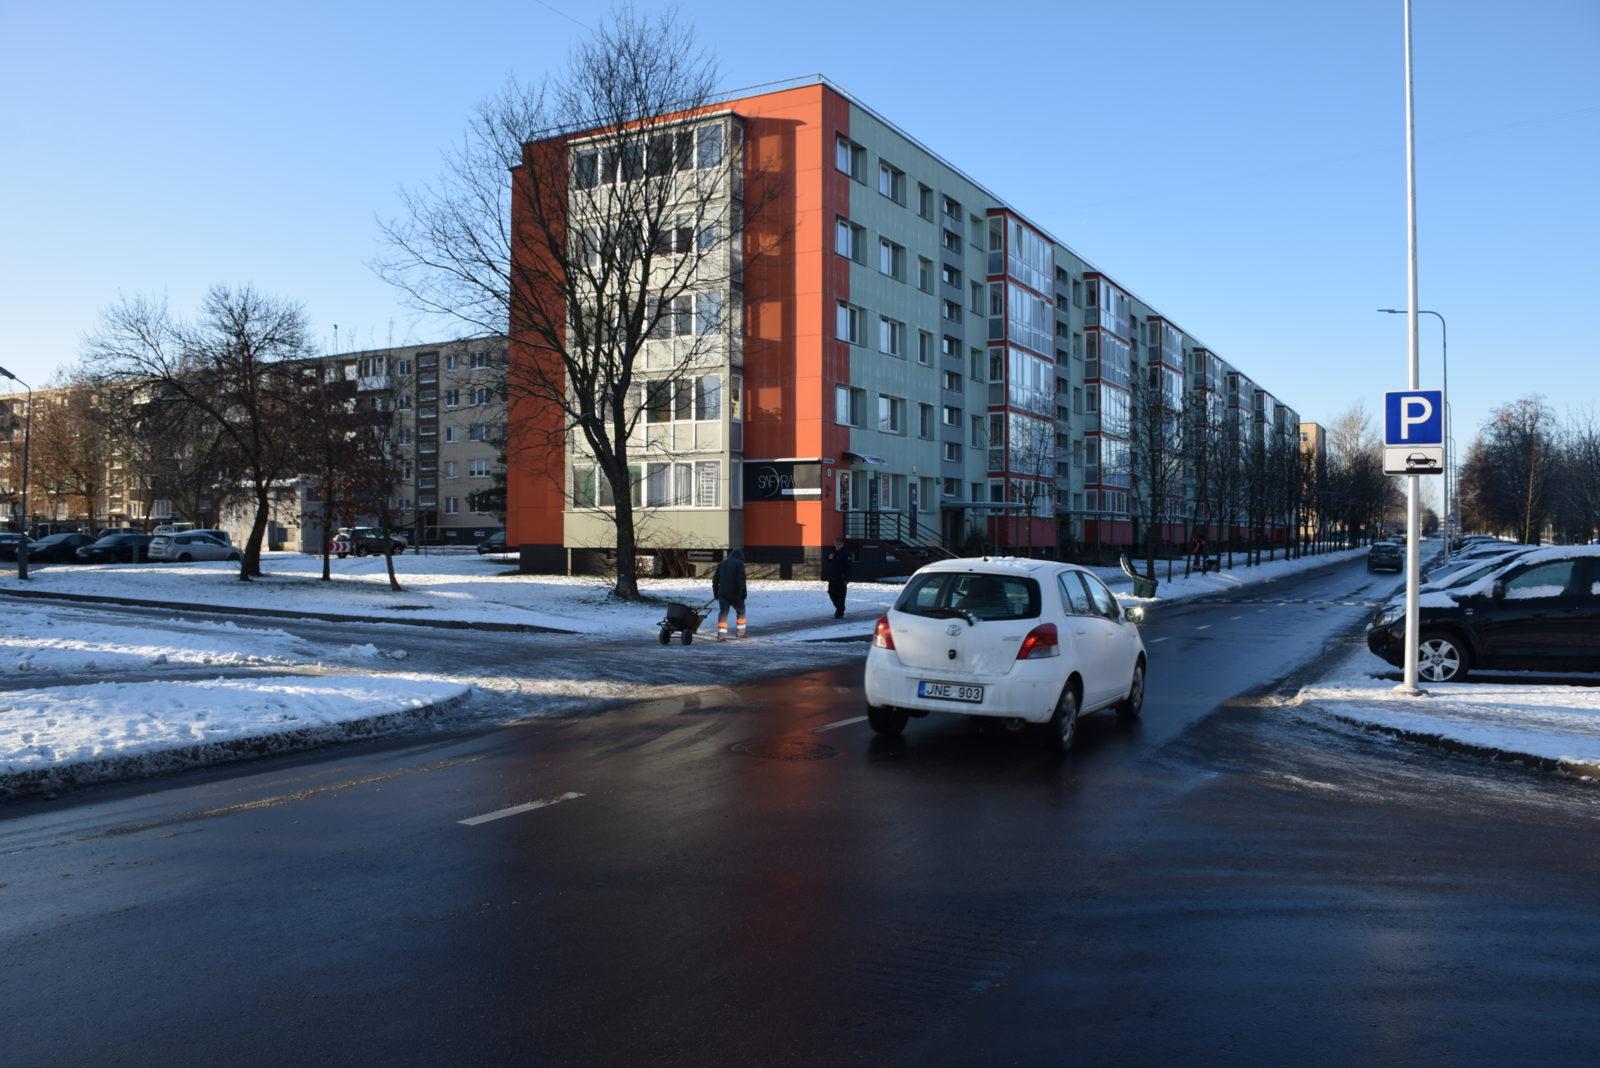 Užbaigta Statybininkų gatvės rekonstrukcija